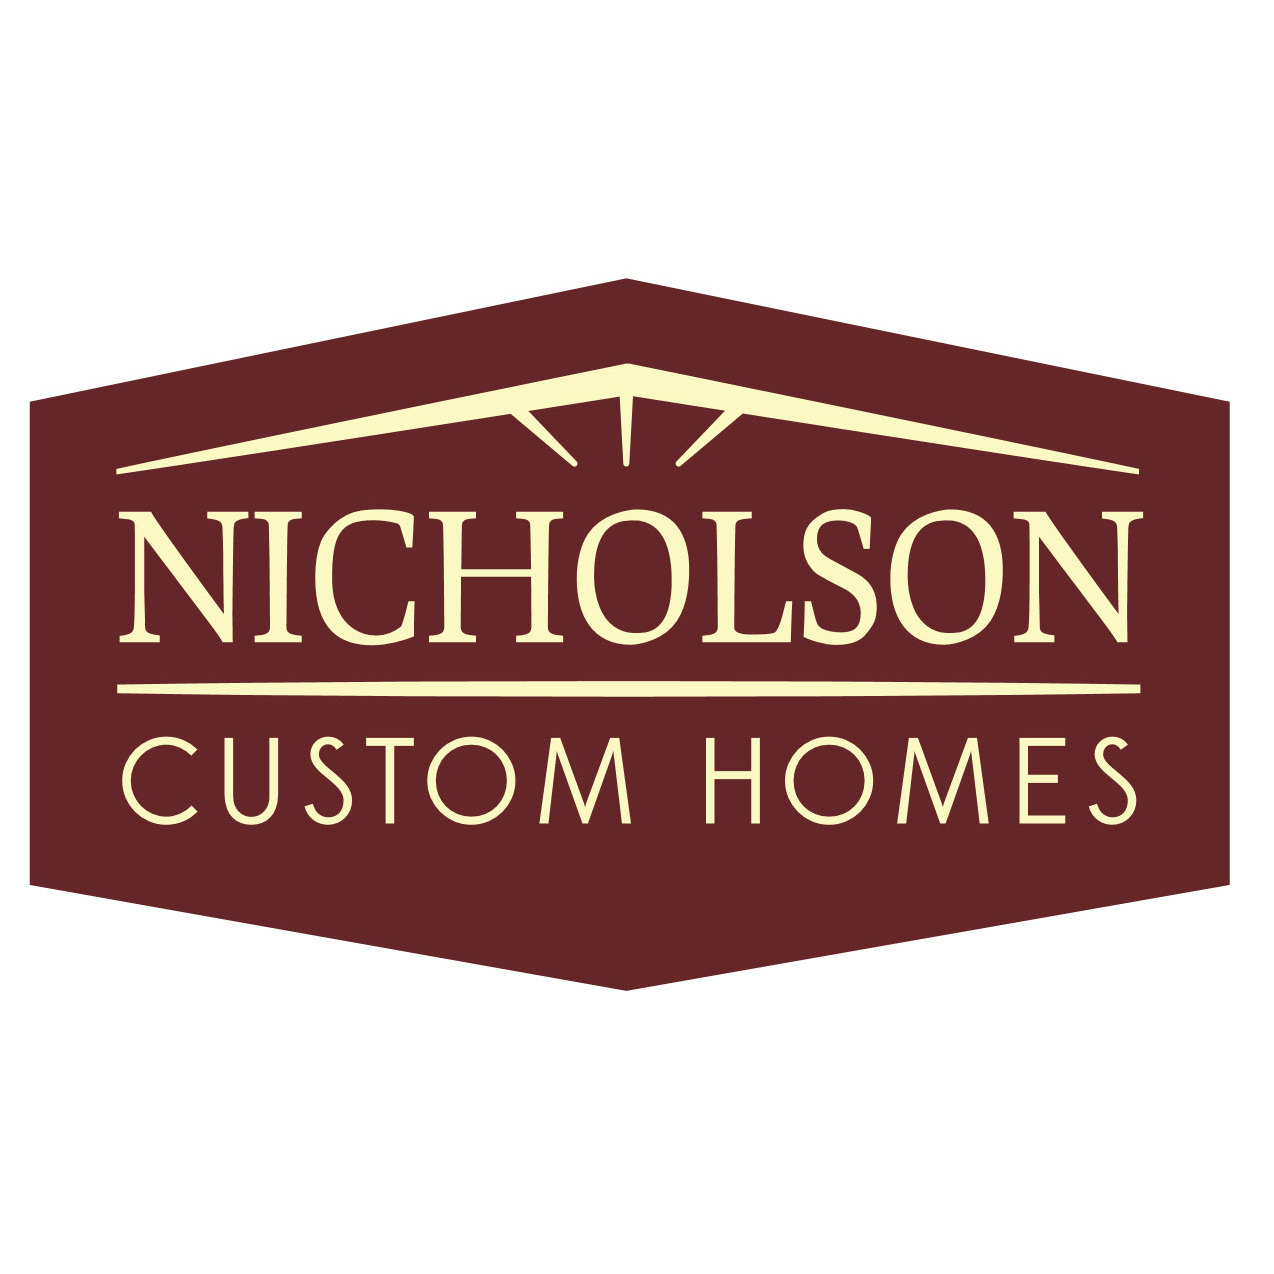 Nicholson Custom Homes - Scottsdale, AZ 85262 - (480)694-1442 | ShowMeLocal.com